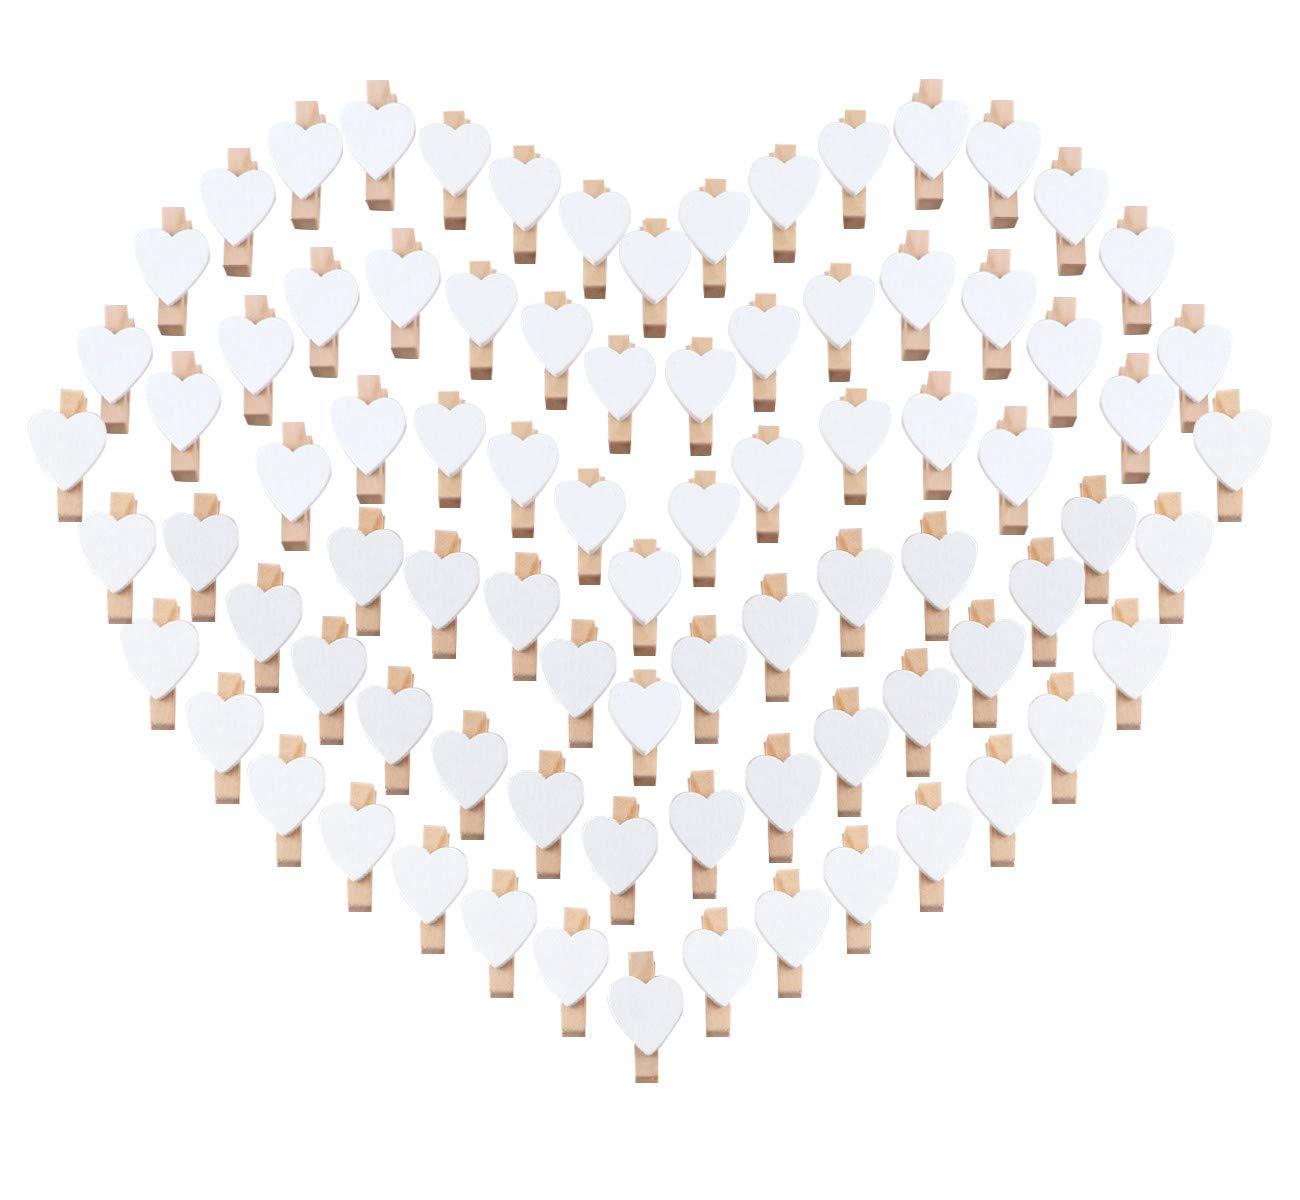 100pcs Pinzas de Madera con Coraz/ón 3.5cm Adorno de Fotos Absofine para Celebraci/ón Boda Papel Fotogr/áfico Clips de Artesan/ía Ropa Blanca